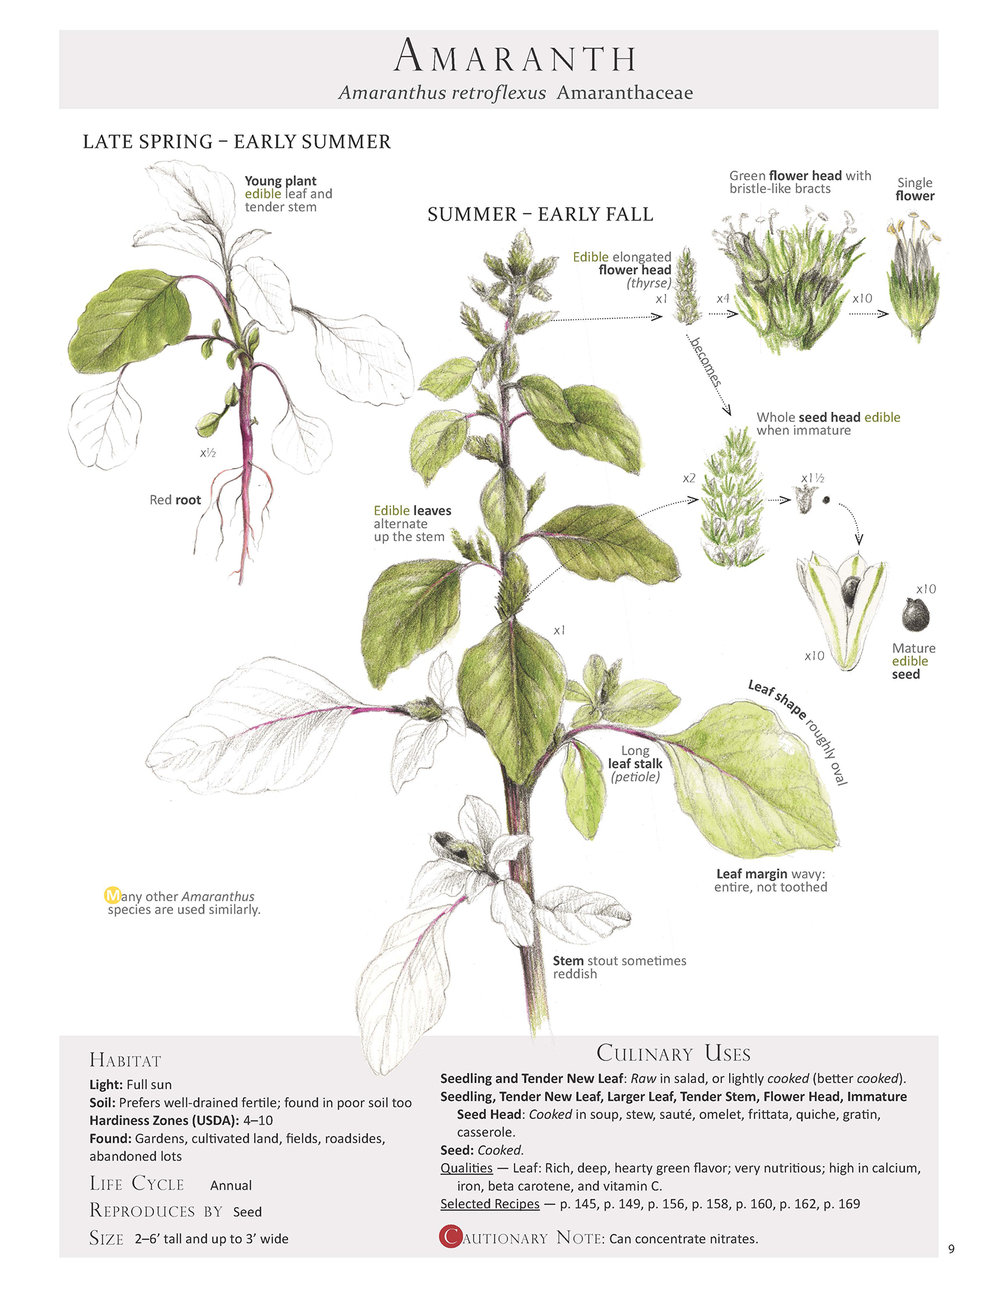 Amaranth-Amaranthus retroflexus.jpg